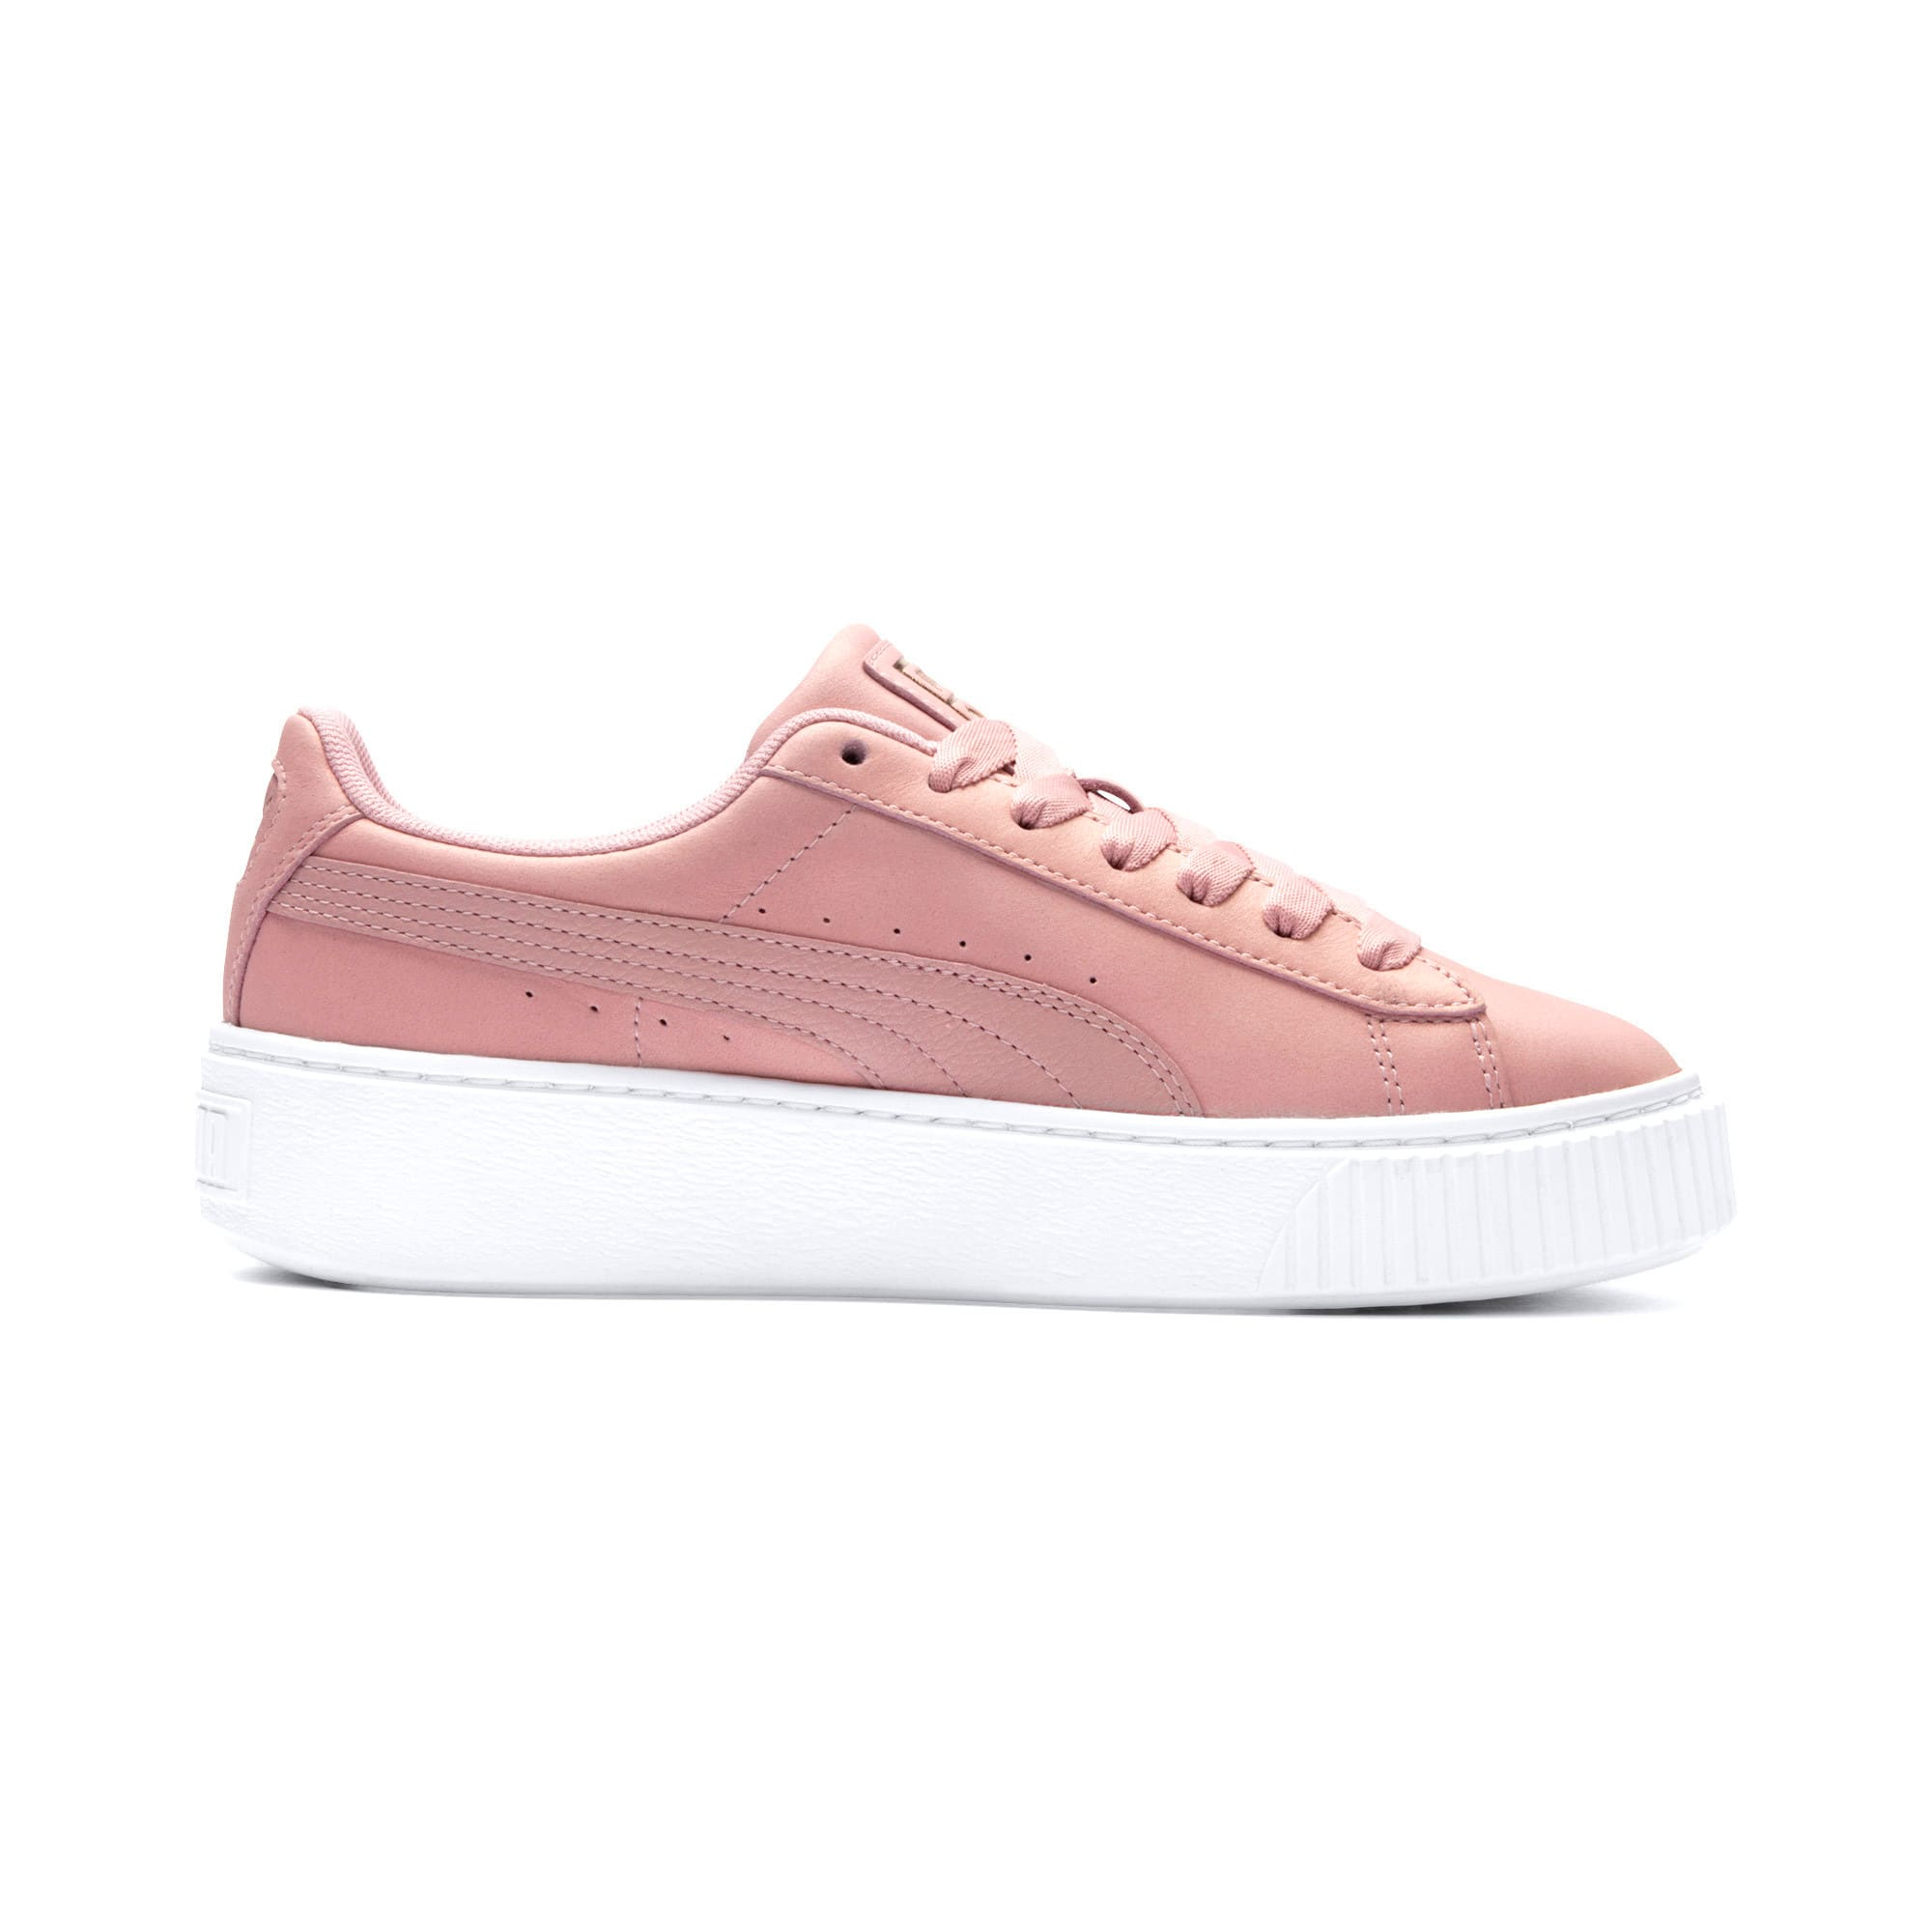 Damen Sneaker Pink von Puma | CLINIC DRESS